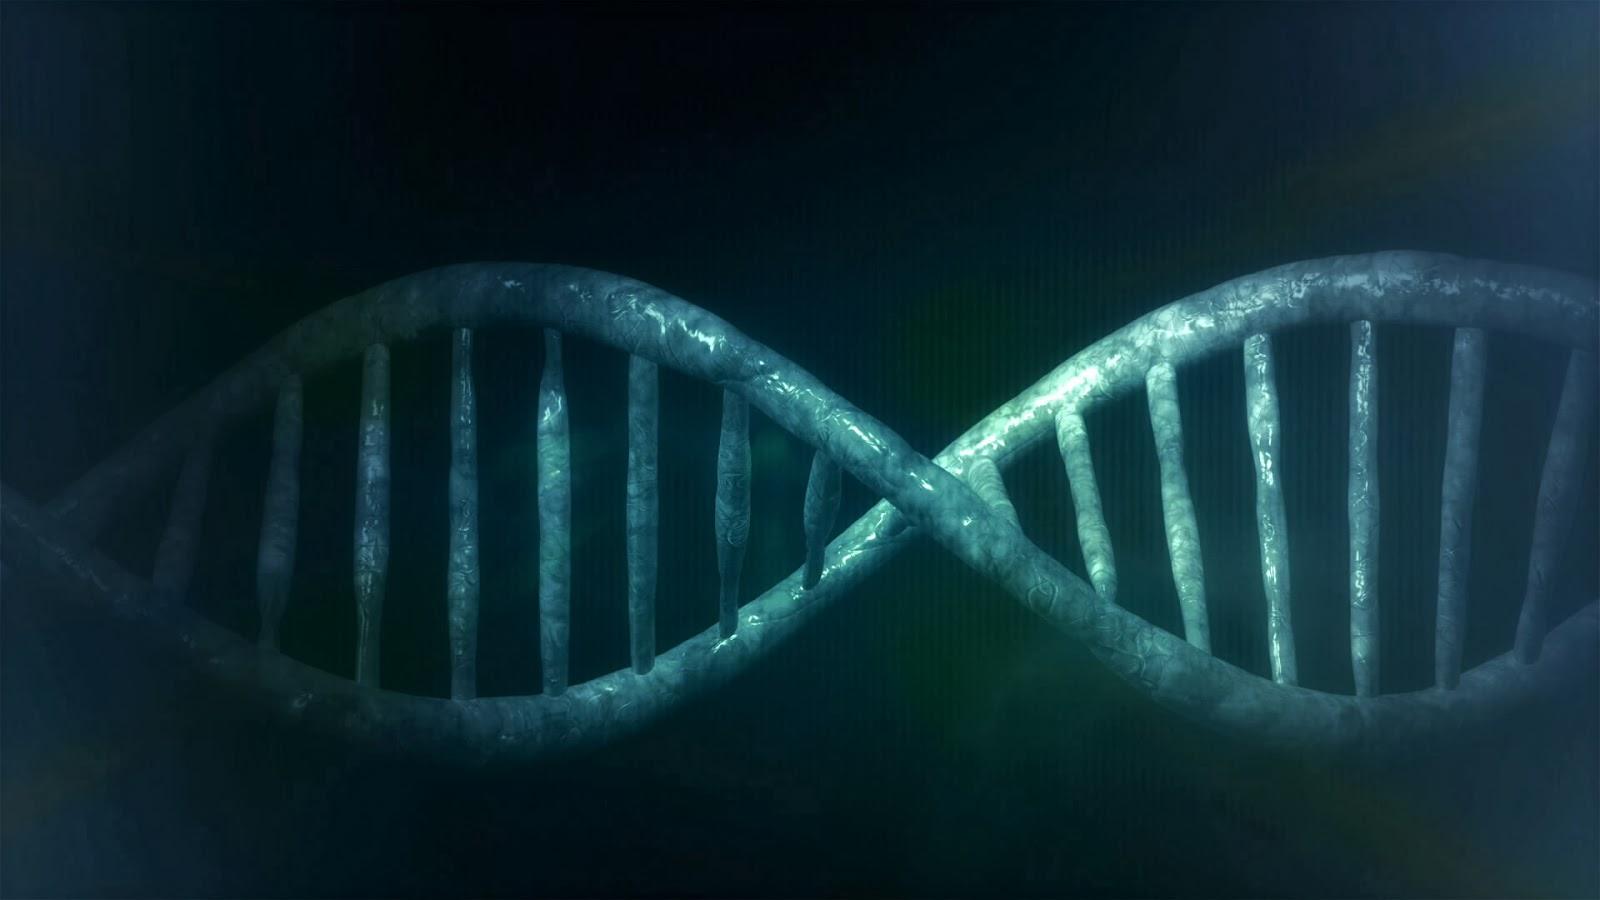 Human DNA by Виталий Смолыгин